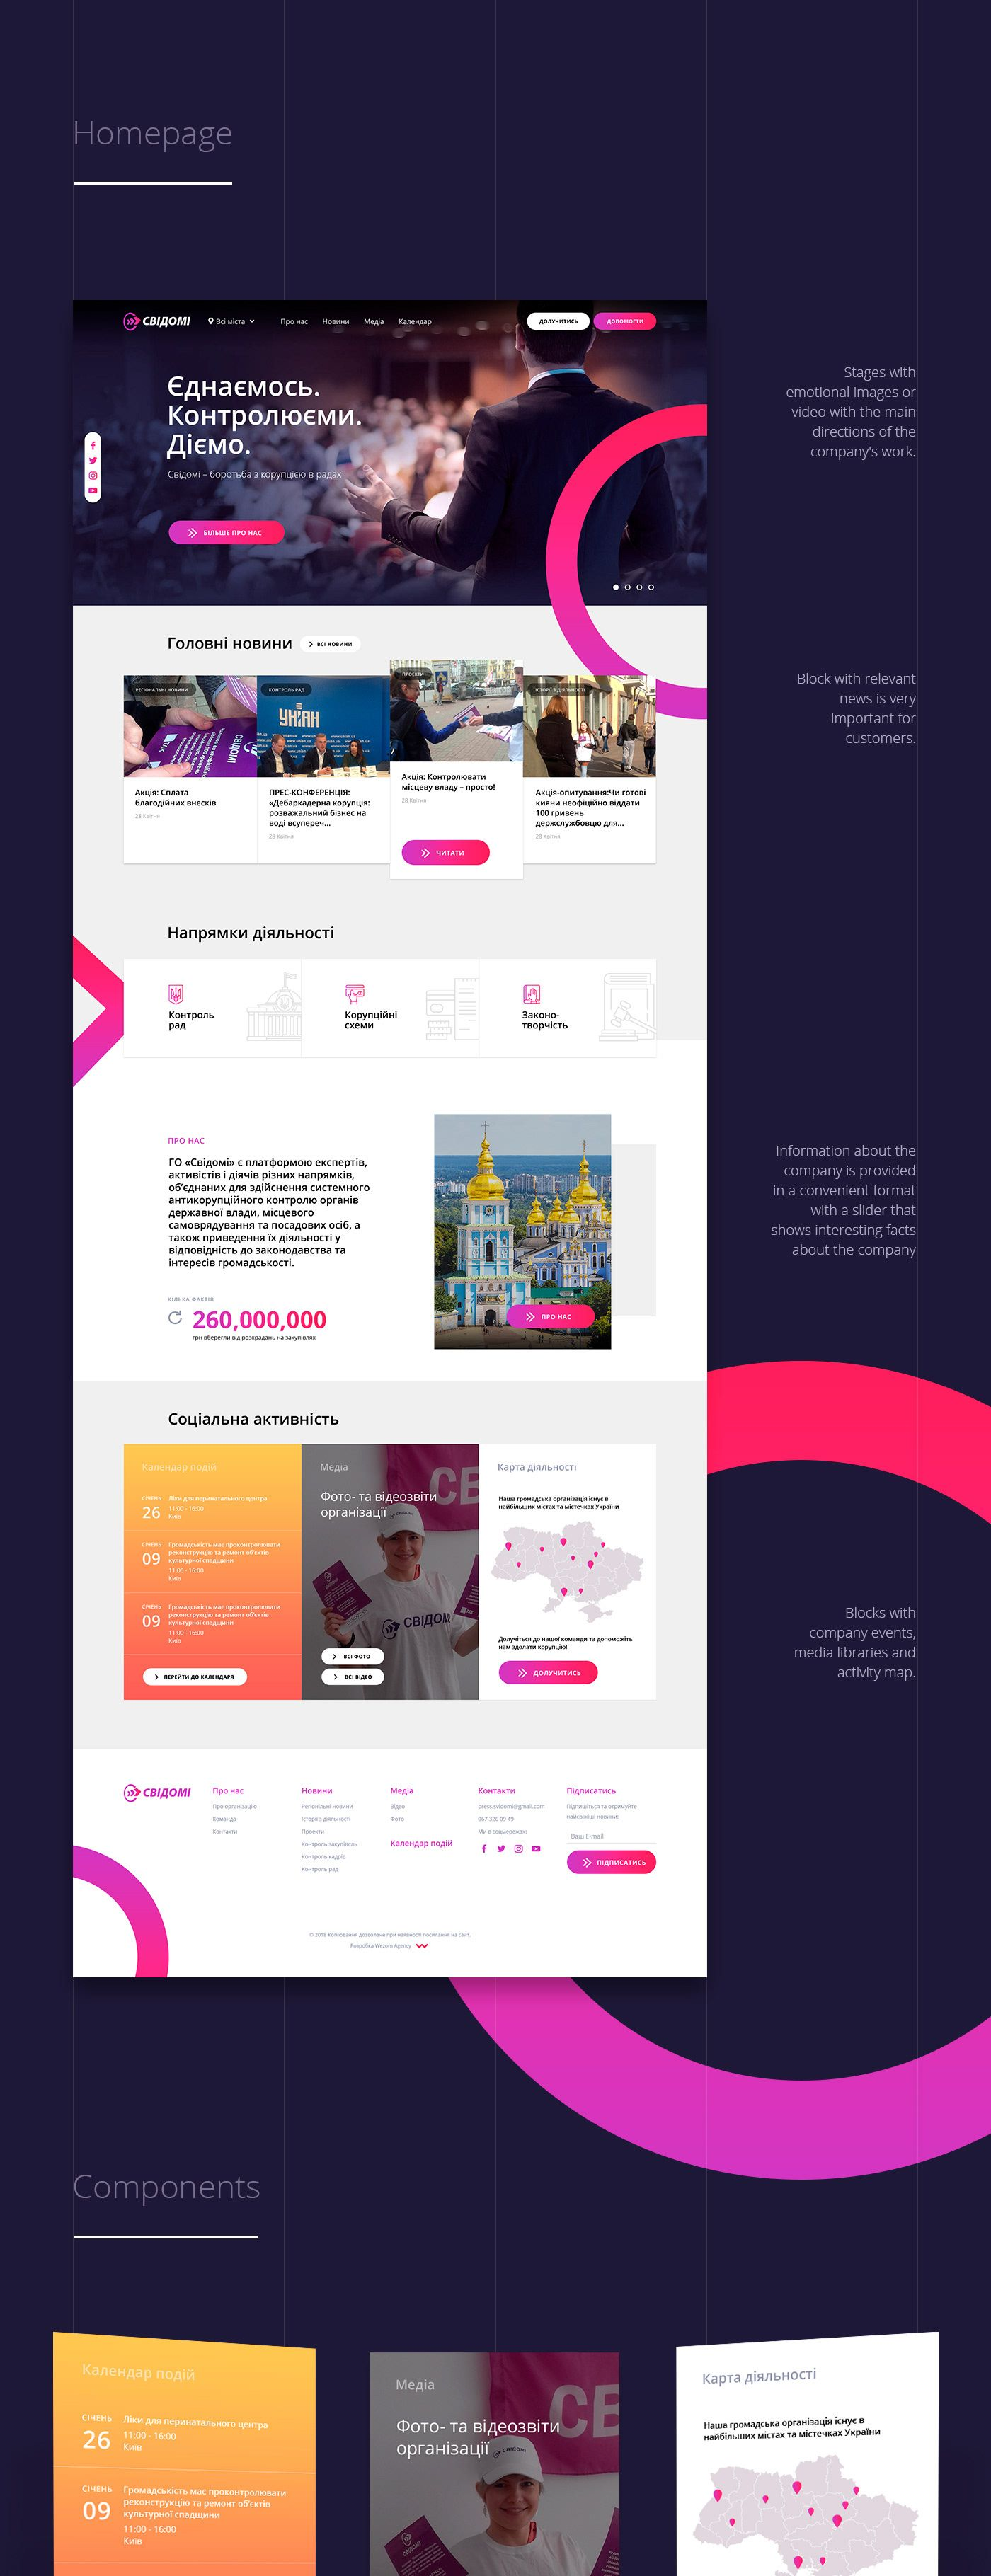 Svidomi Website Redesign On Behance Website Redesign Website Design Wordpress Modern Website Design